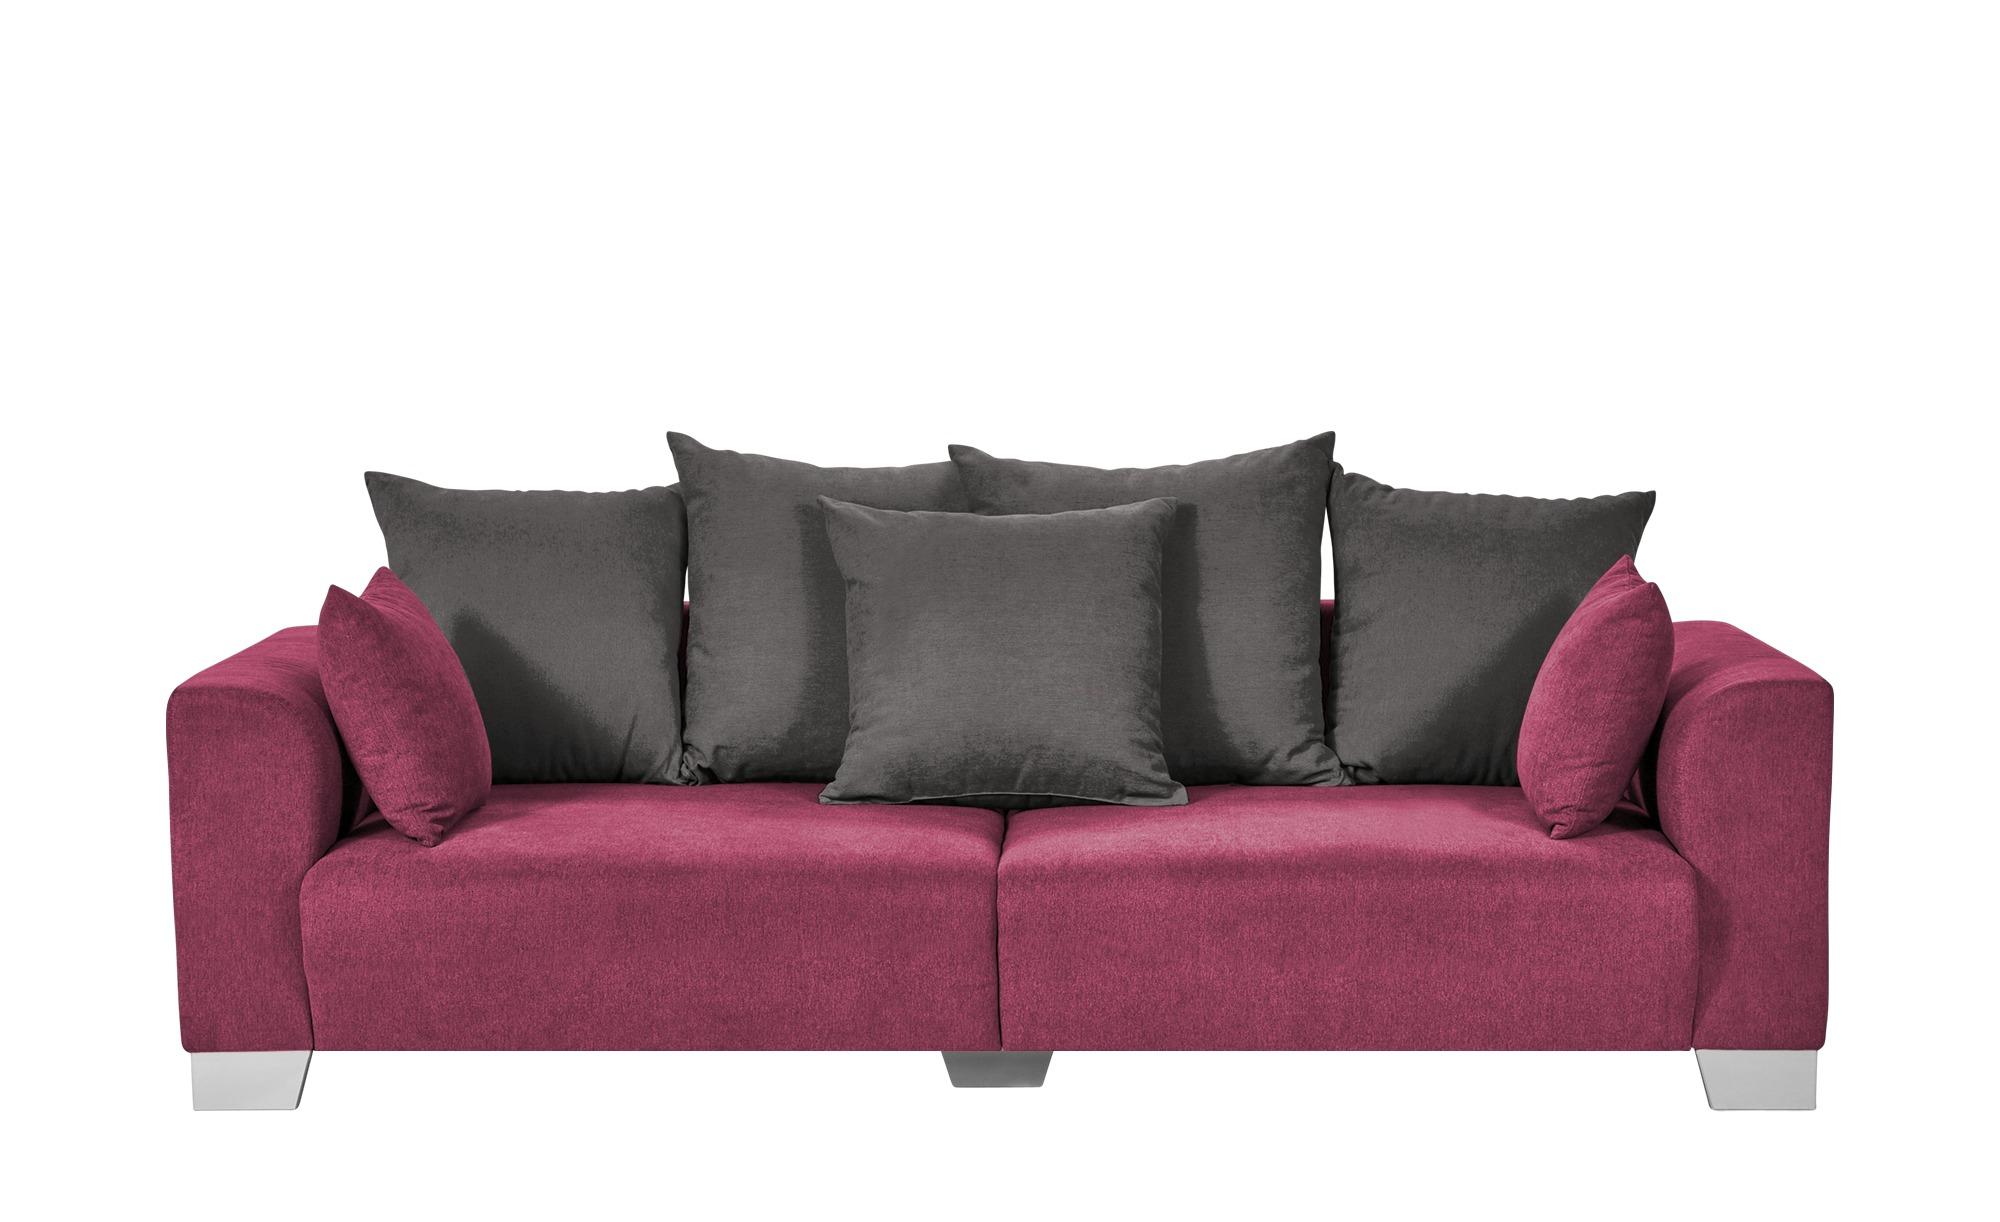 smart Big Sofa bordeaux - Flachgewebe Tonja ¦ rot ¦ Maße (cm): B: 244 H: 68 T: 107 Polstermöbel > Sofas > Big-Sofas - Höffner